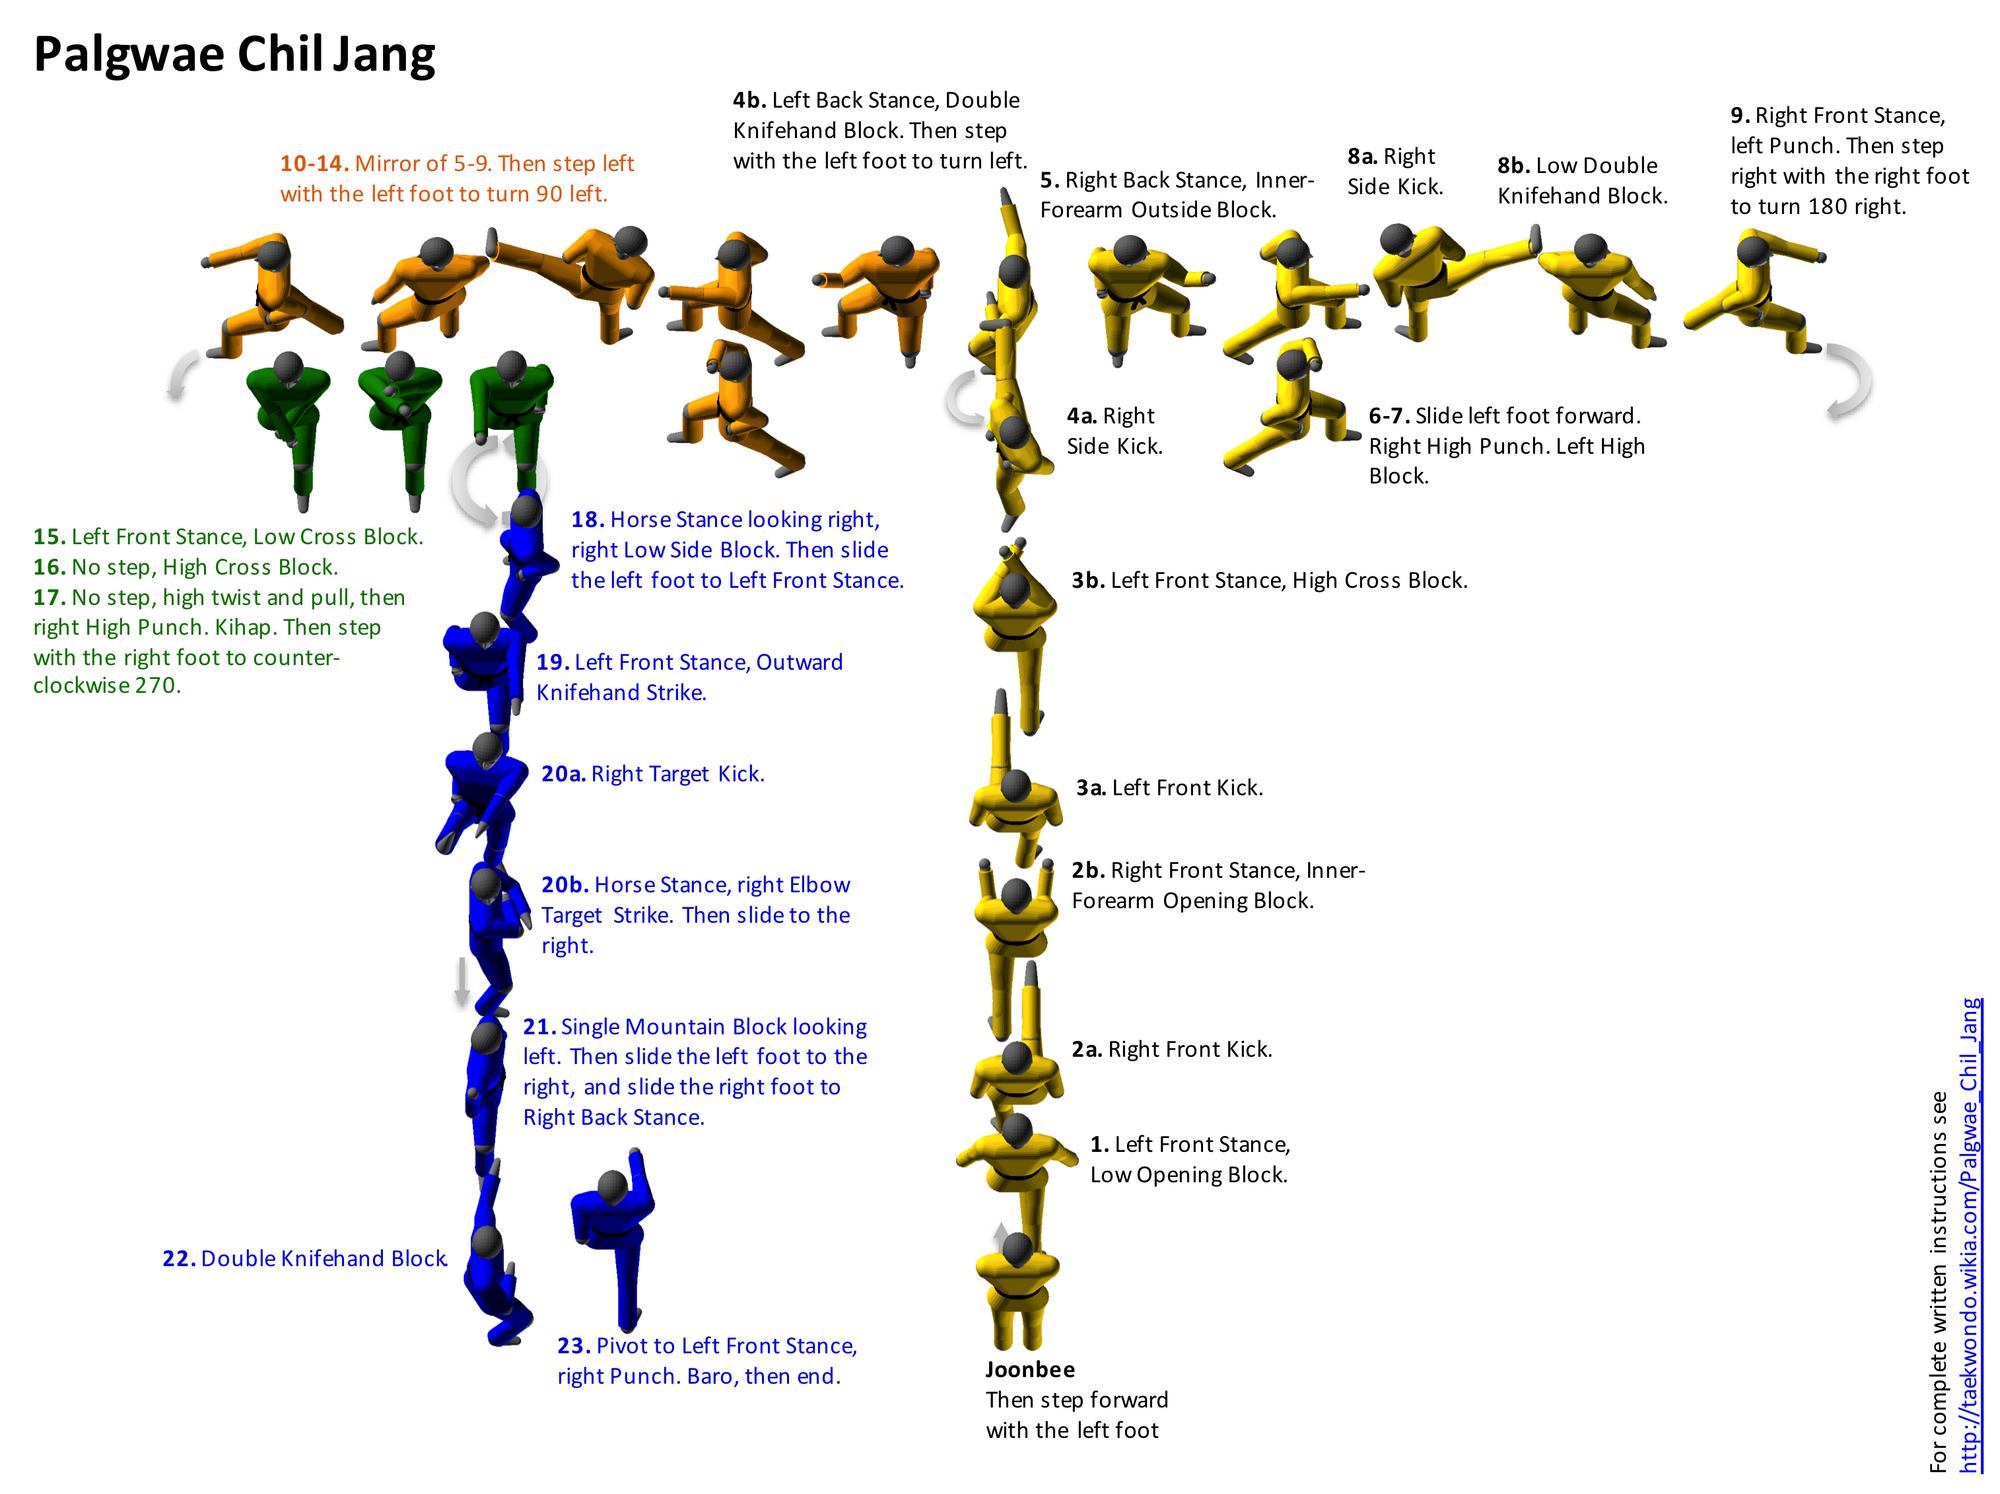 Palgwae Chil Jang | Taekwondo Wiki | FANDOM powered by Wikia